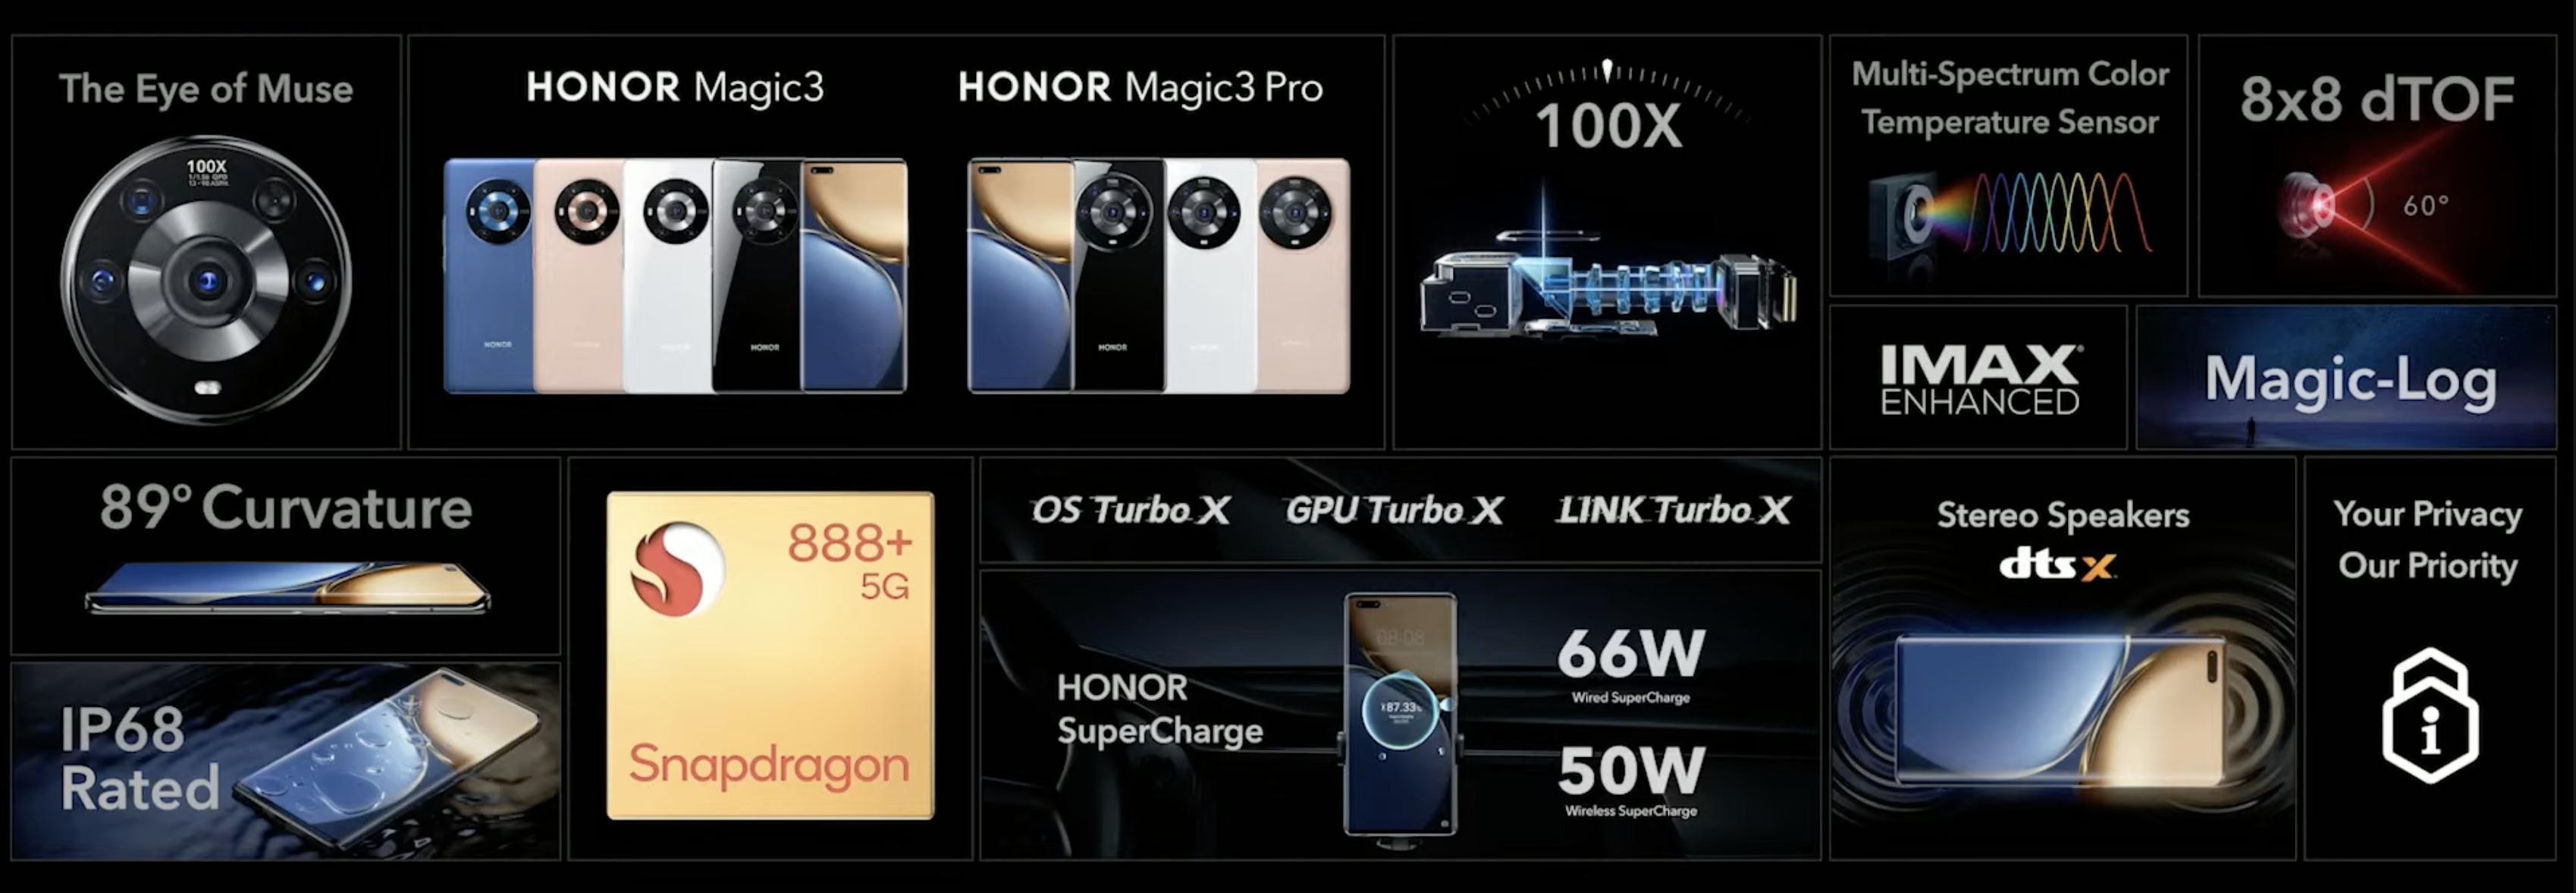 Показан смартфон HONOR Magic 3 с сервисами Google. Дата выхода и цены